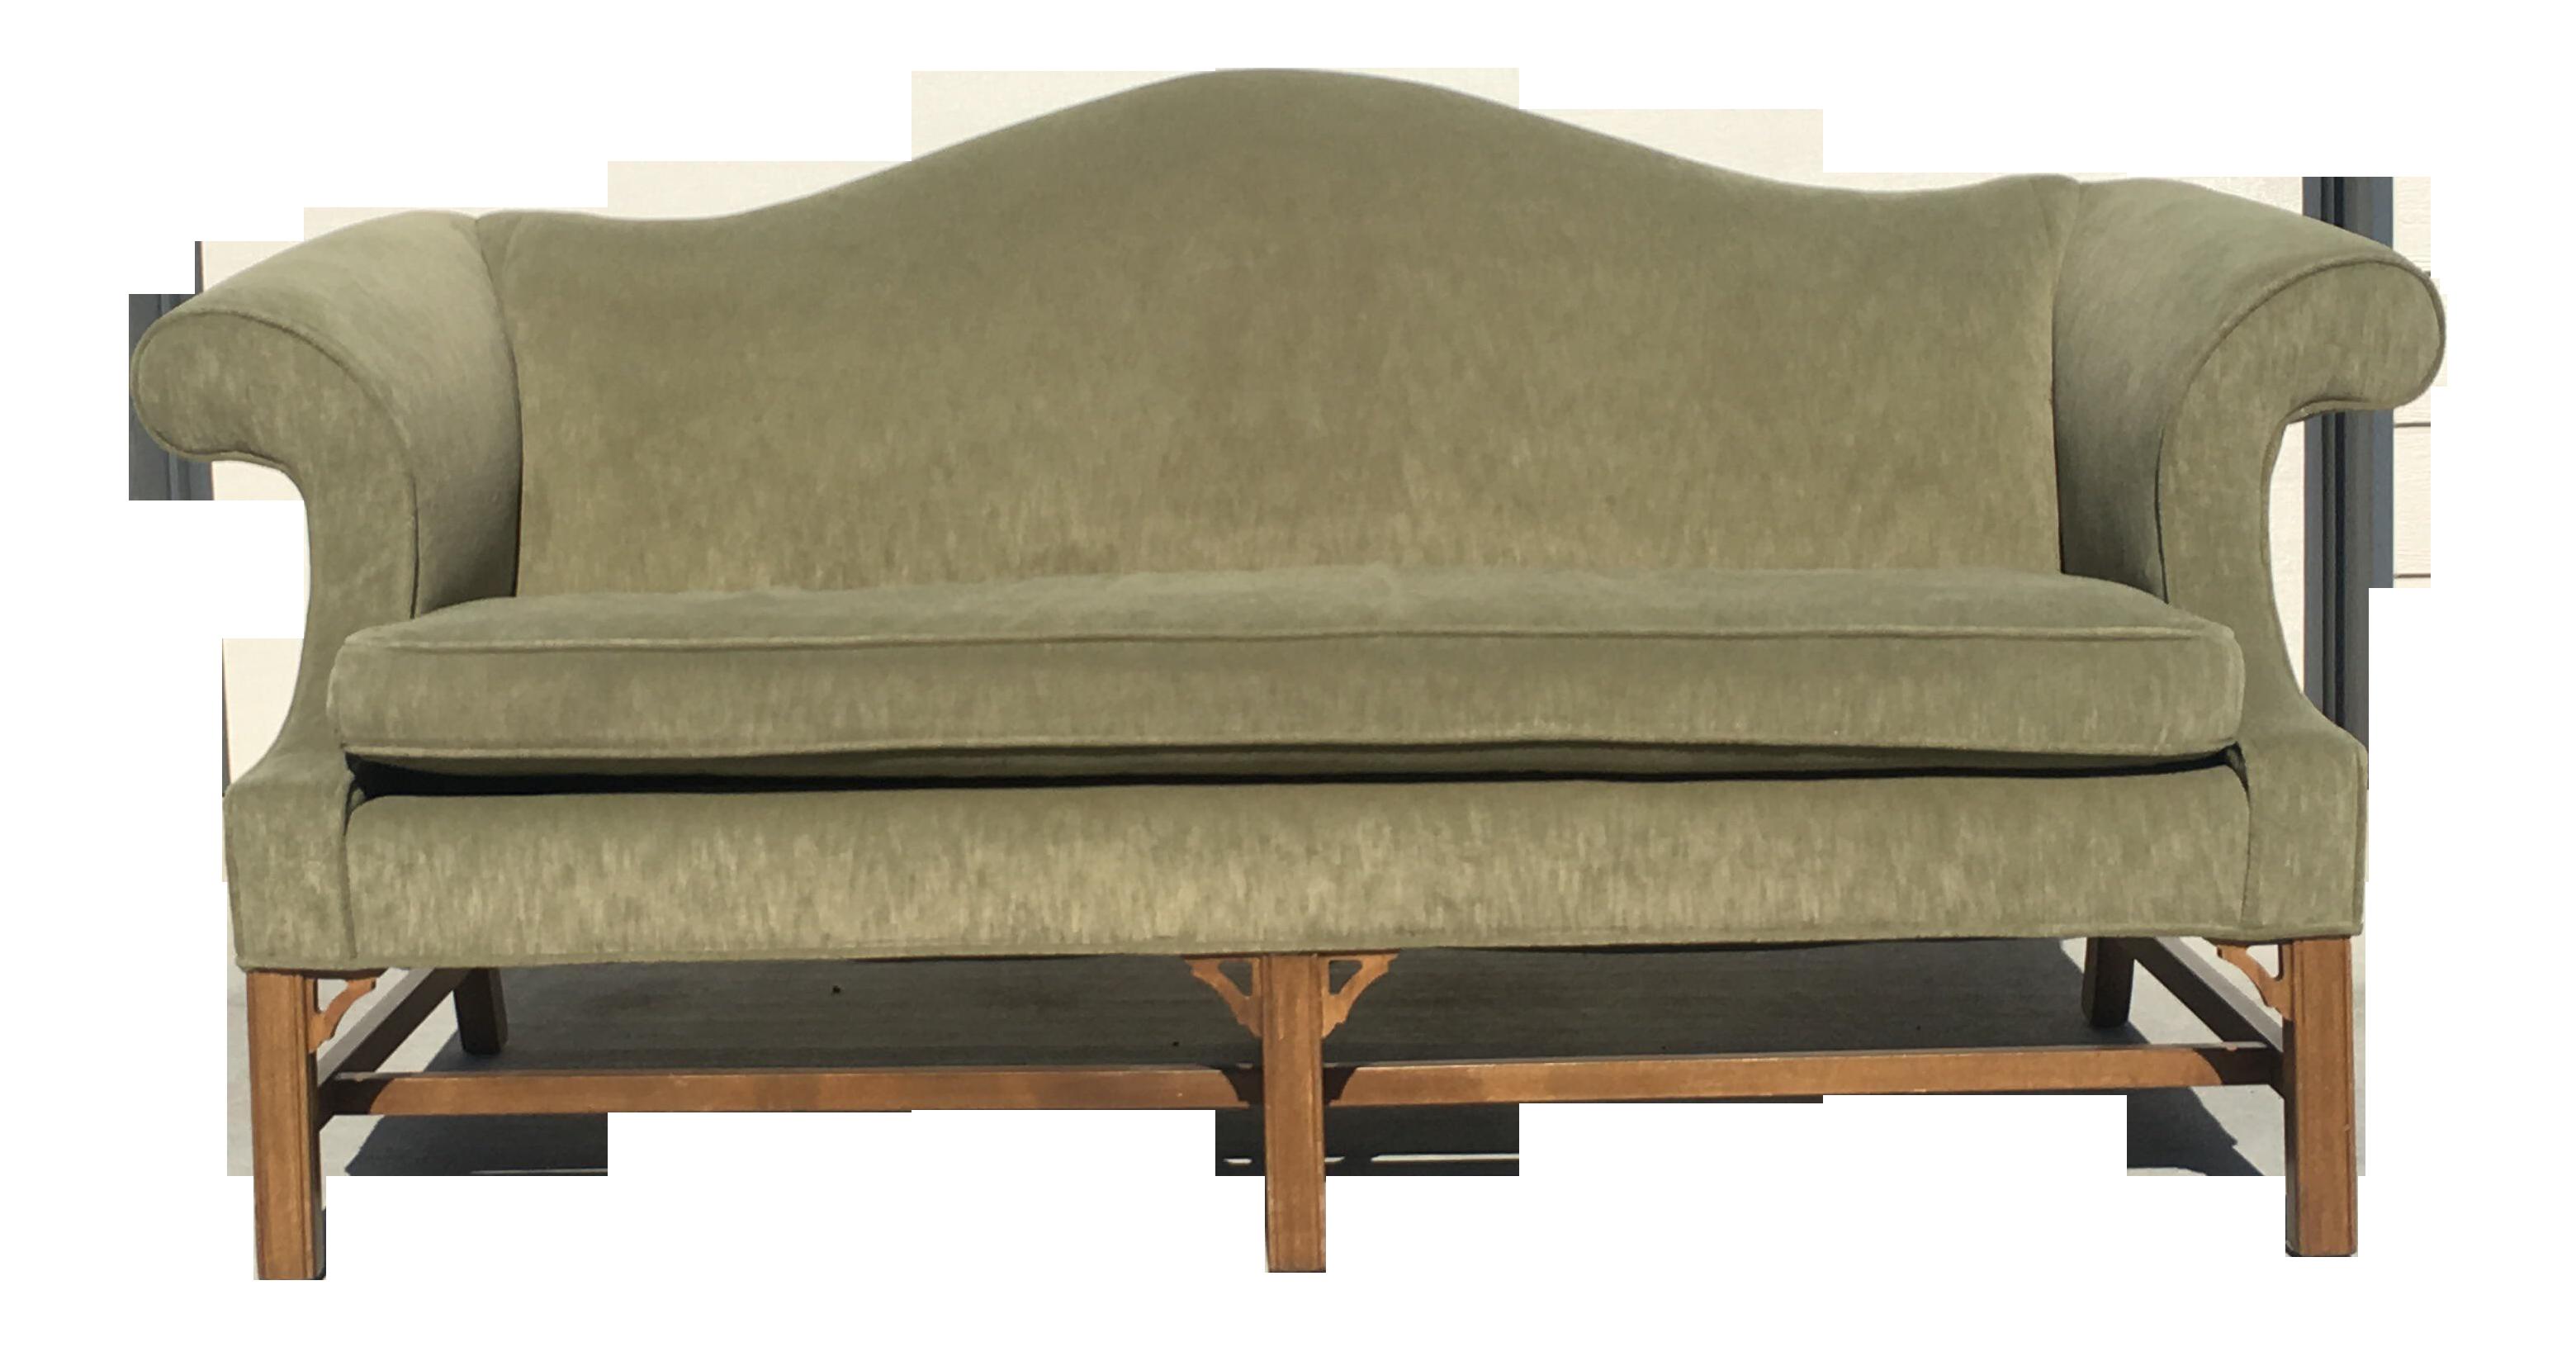 Vintage Ethan Allen Chippendale Style Camel Back Sofa